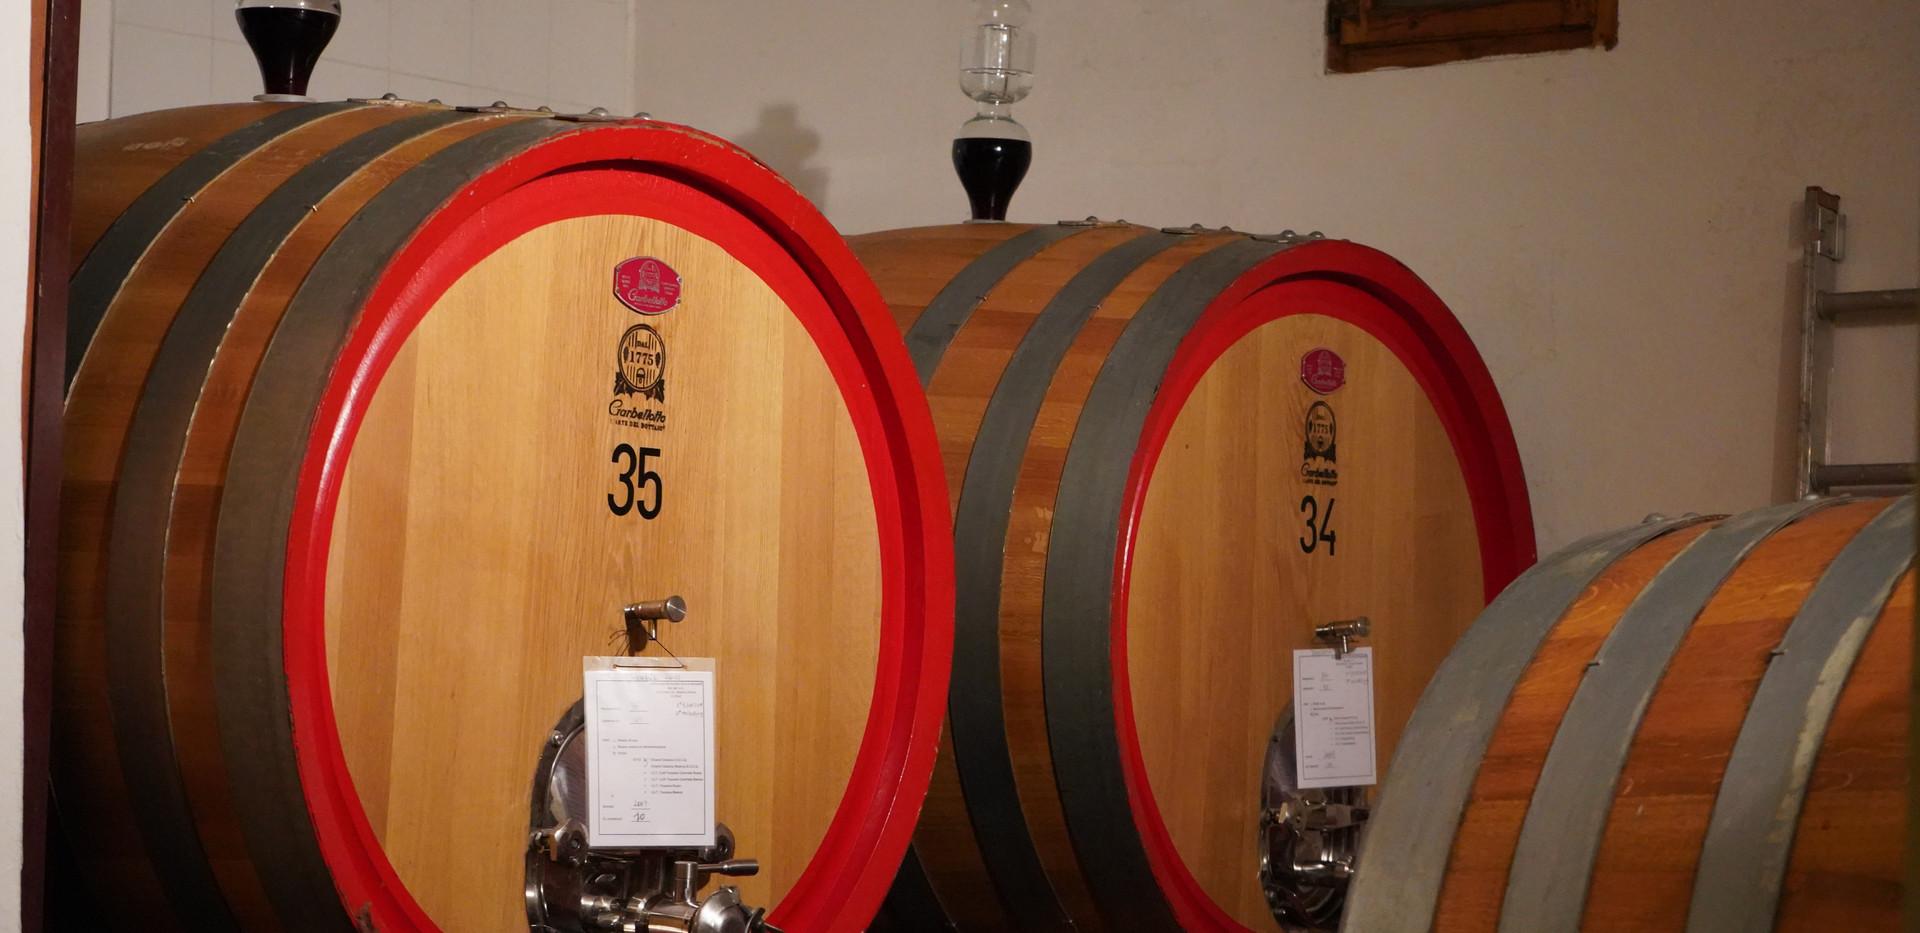 Full-day in Chianti Classico - the barrels